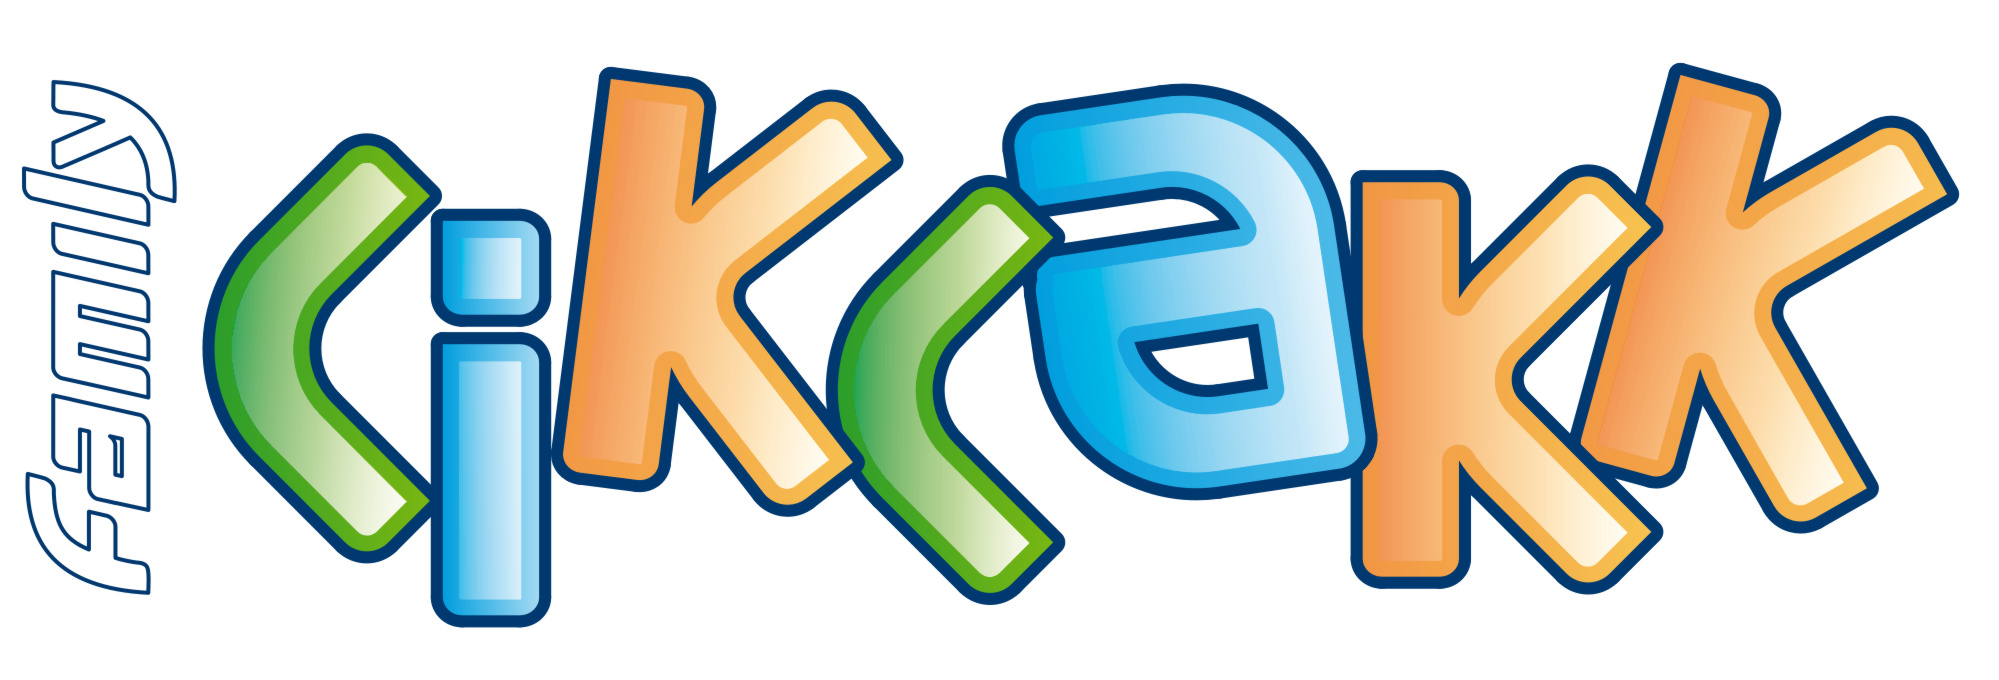 family_cikcakk_logo_nagy